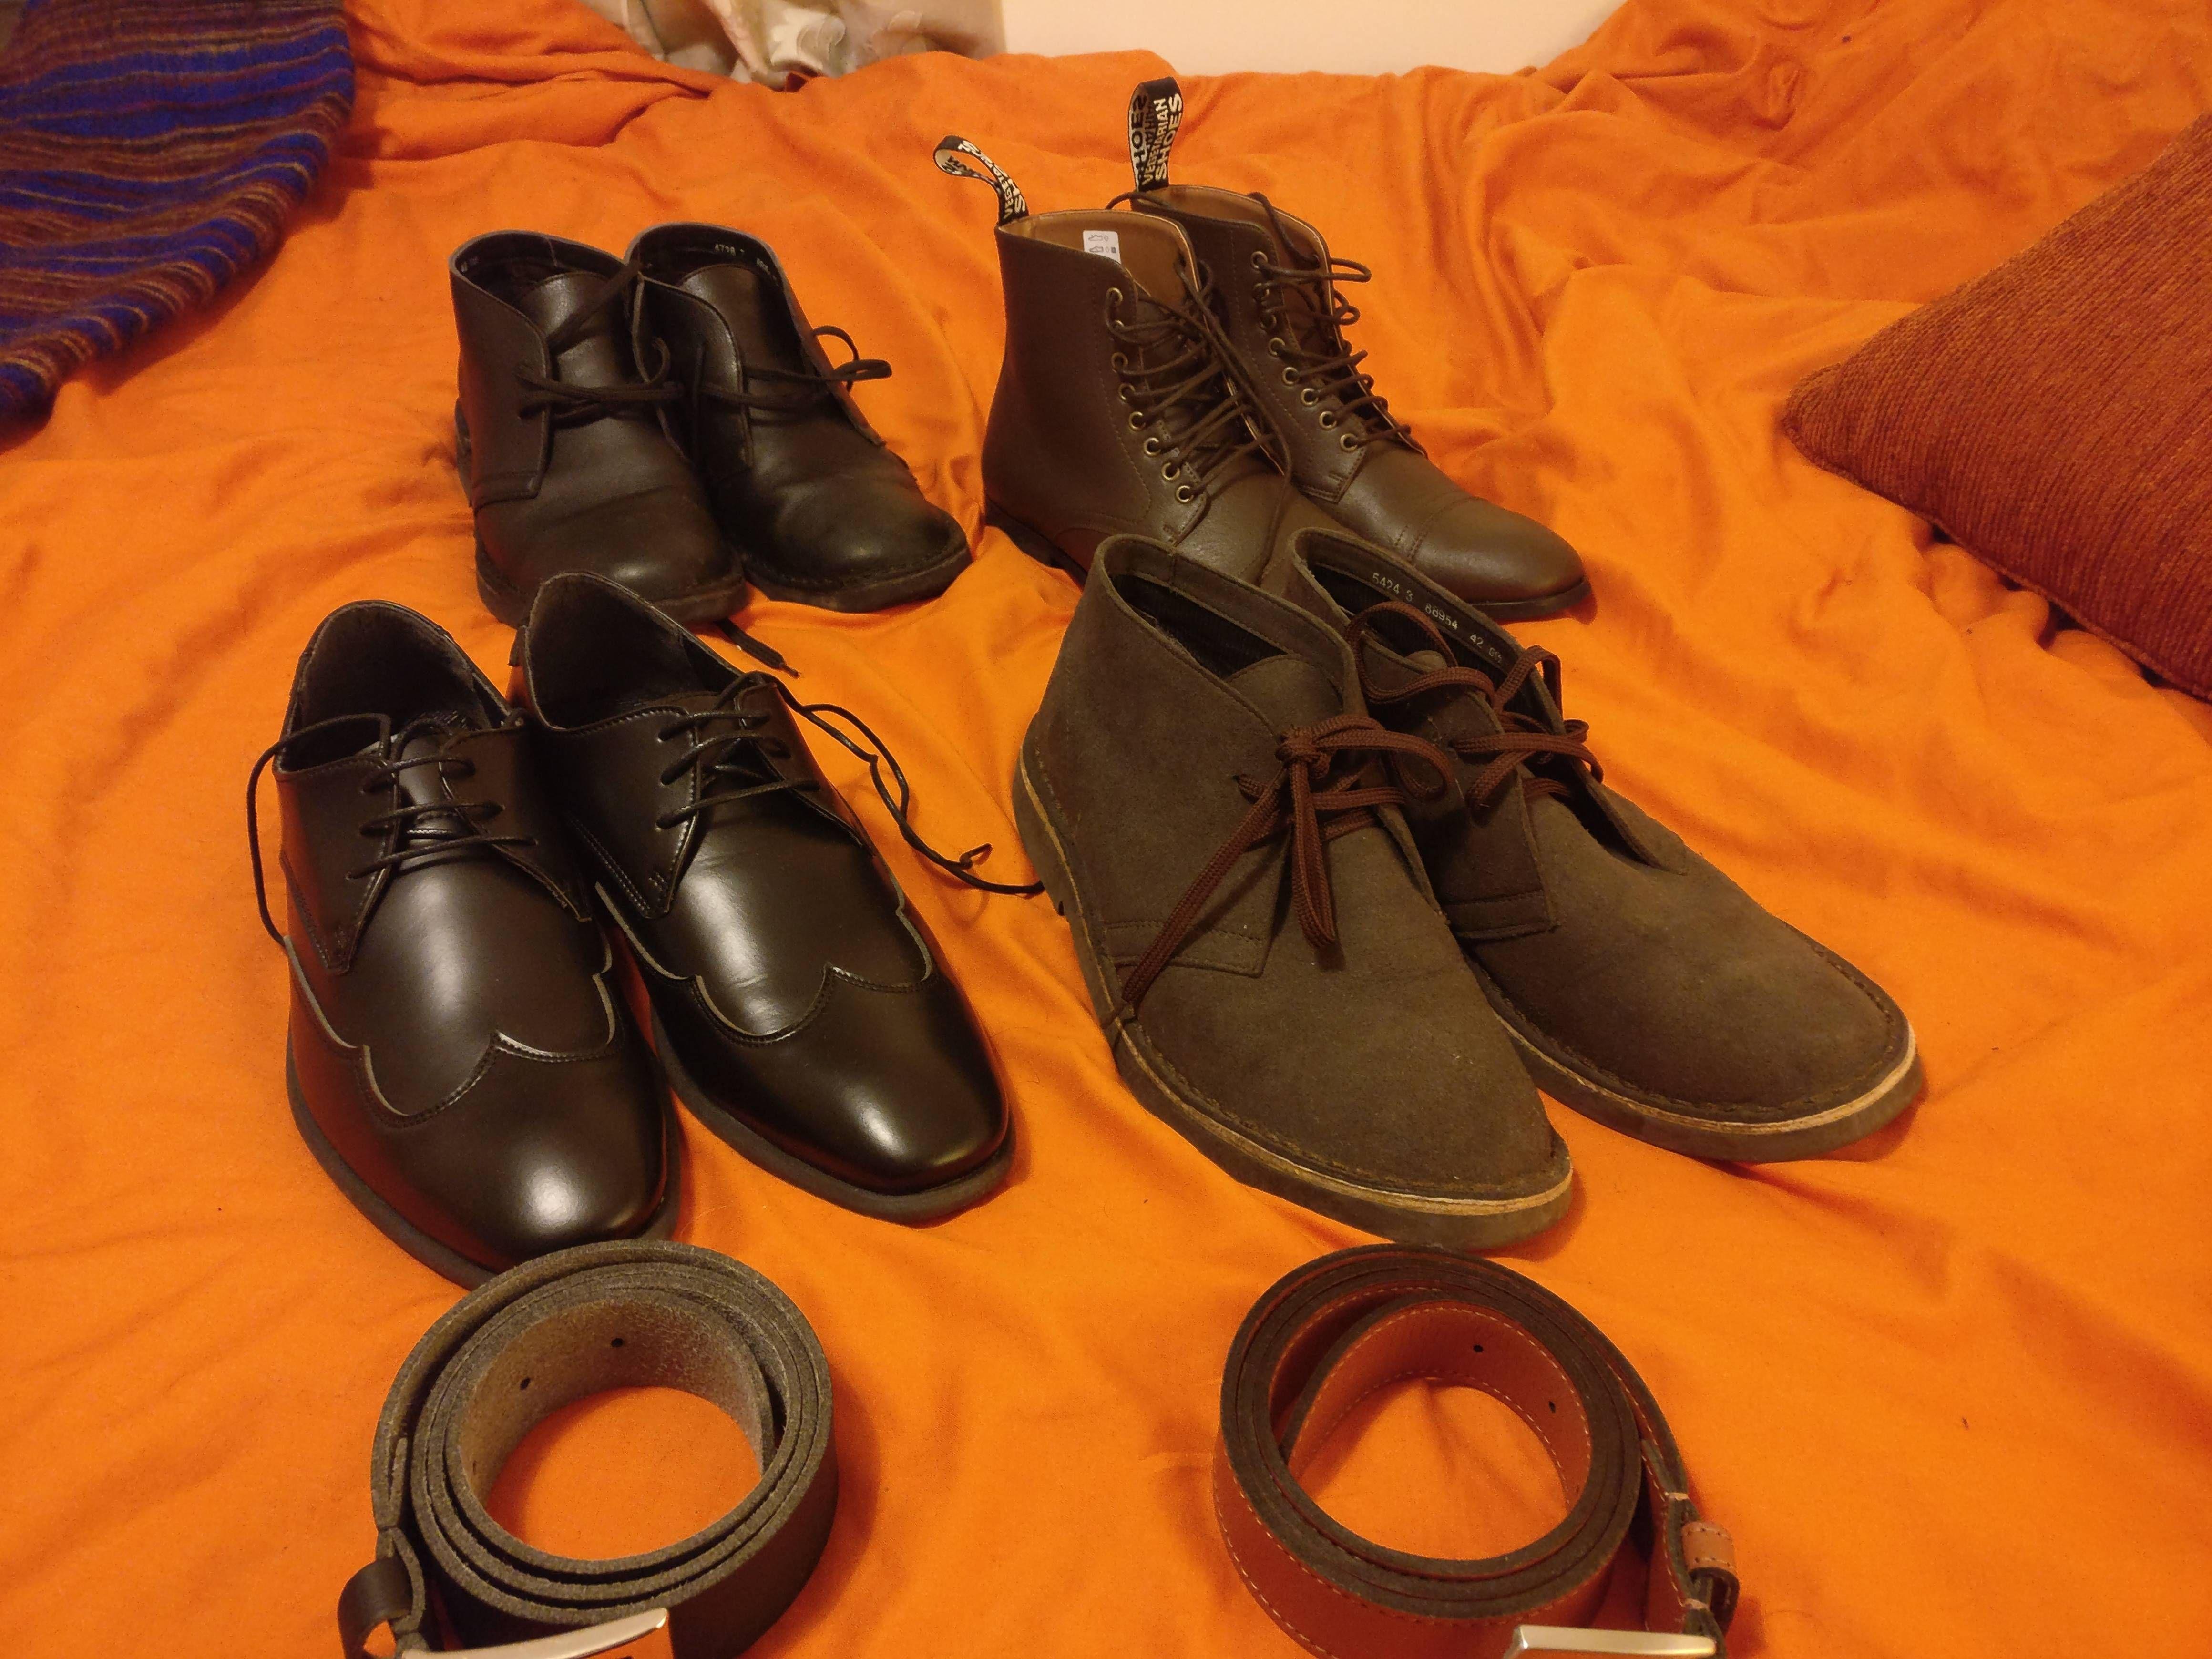 Vegan shoe and belt family